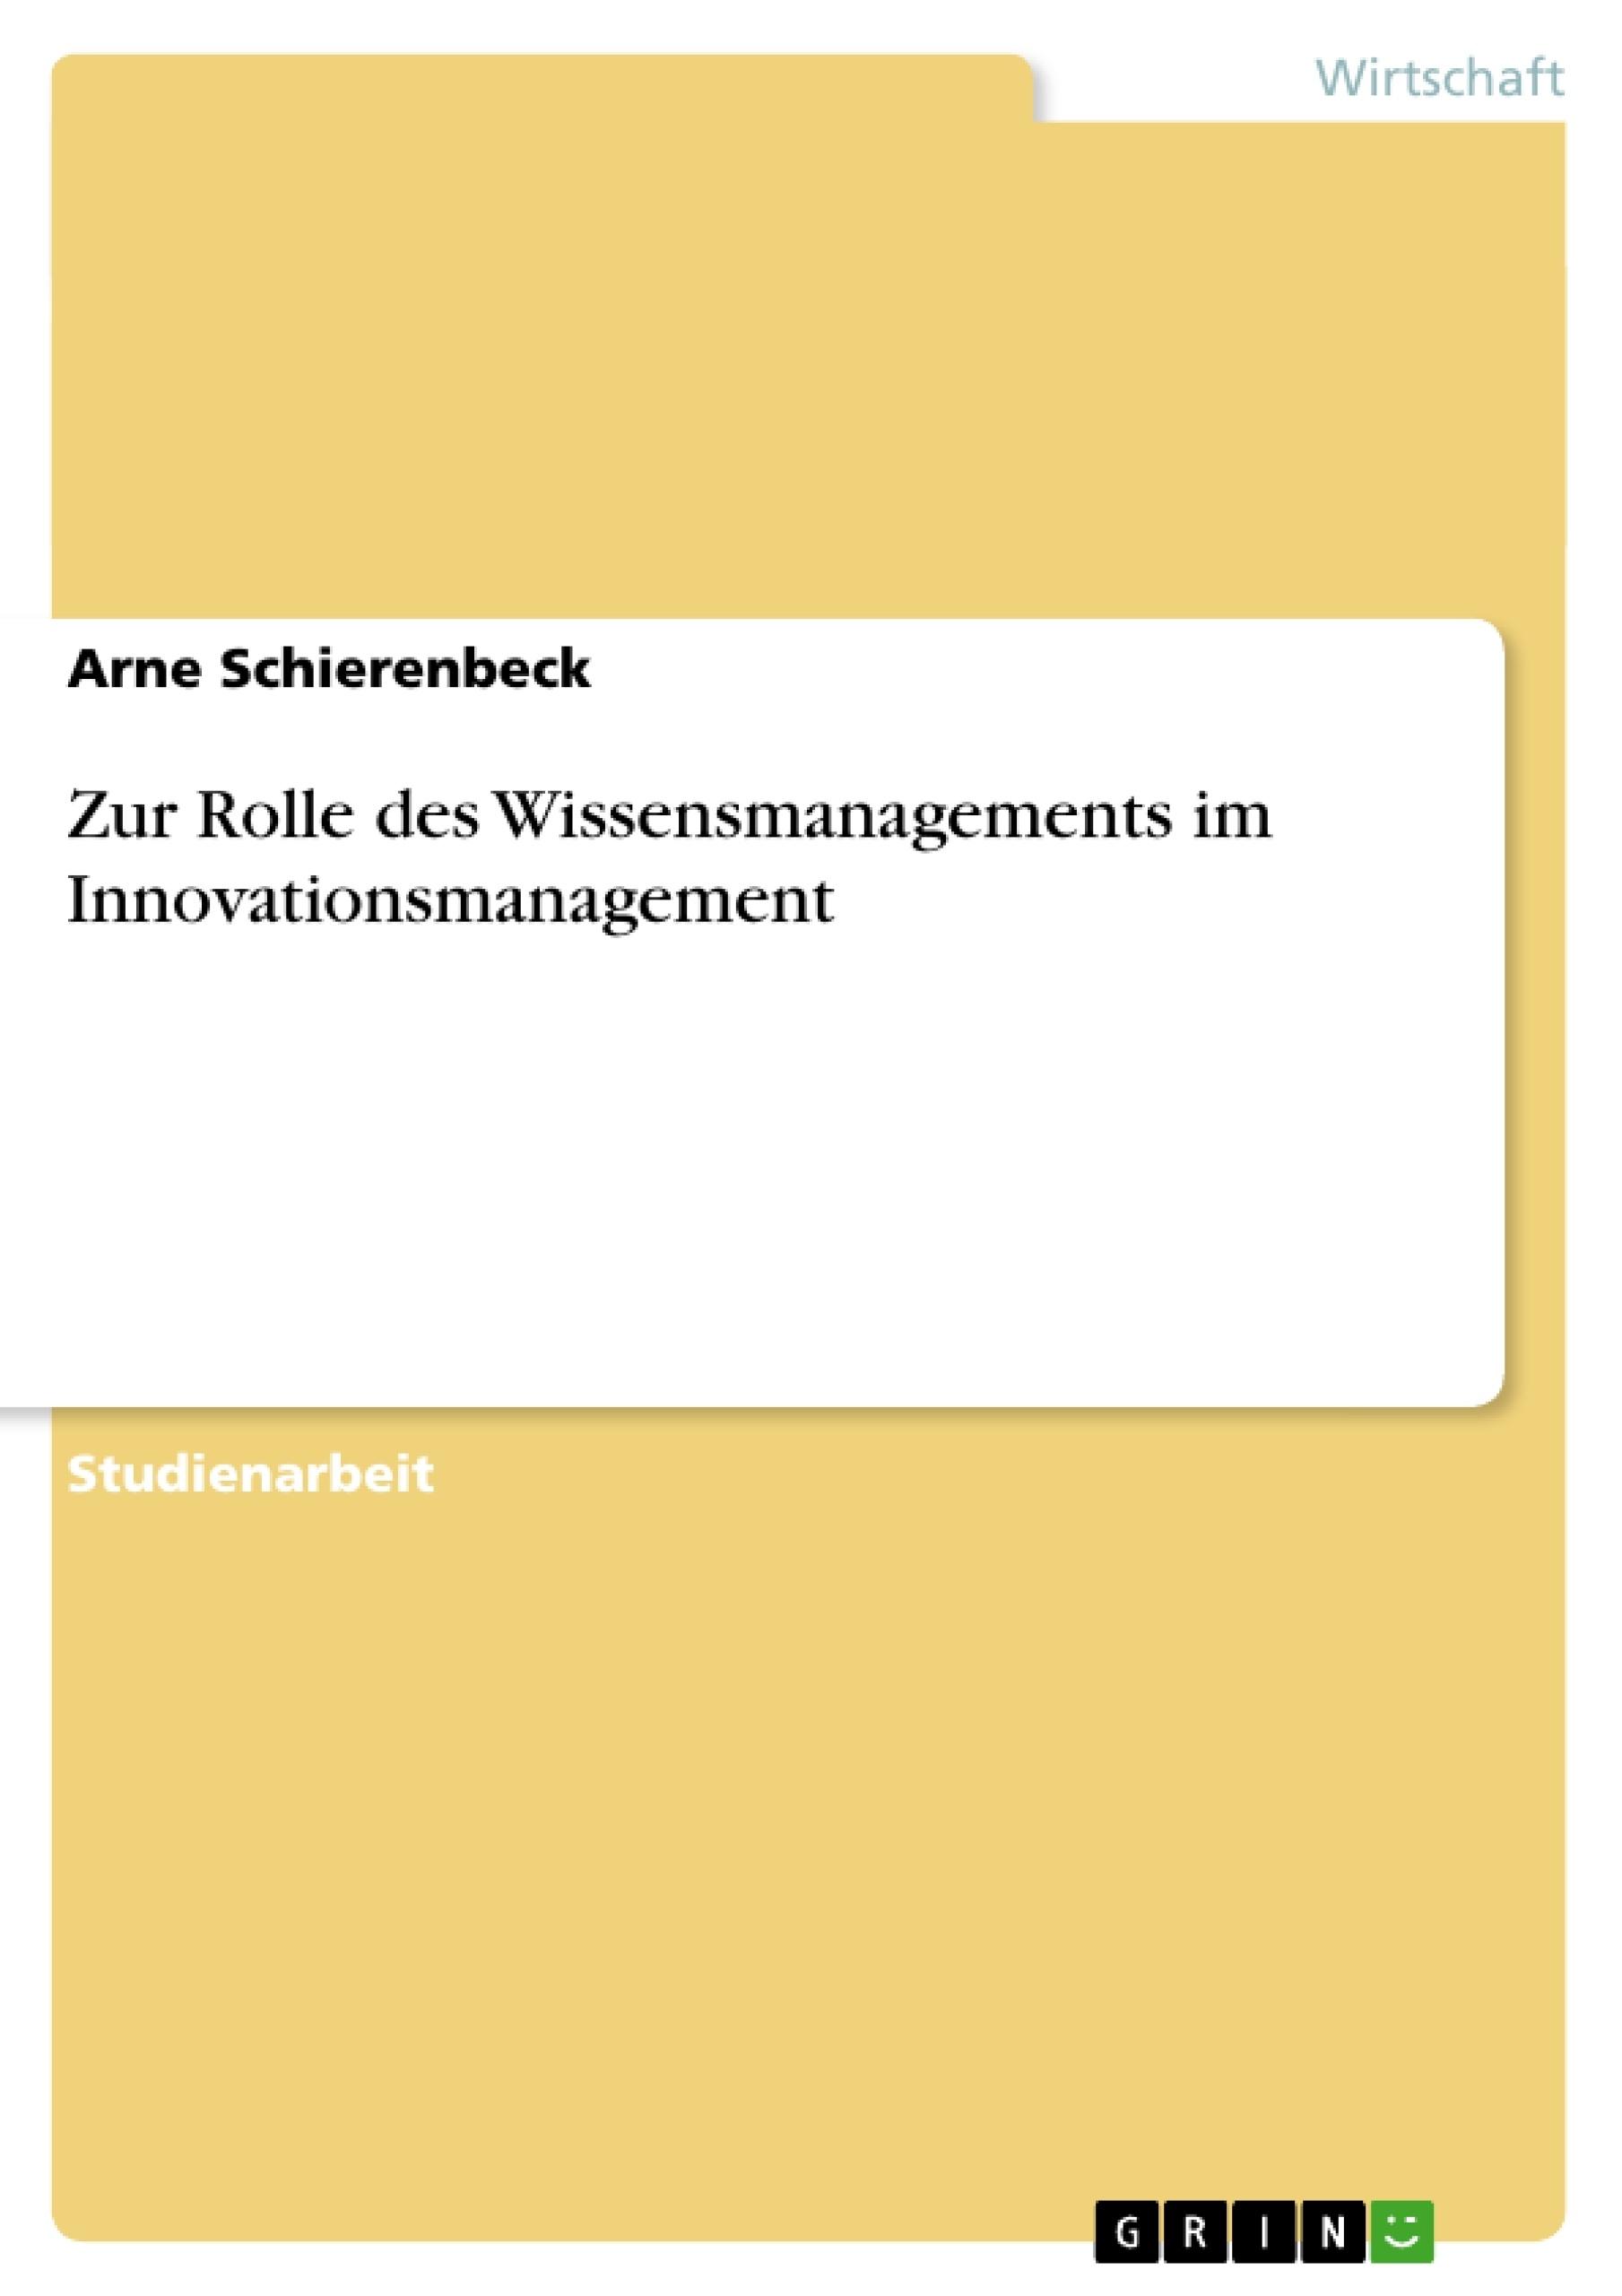 Titel: Zur Rolle des Wissensmanagements im Innovationsmanagement